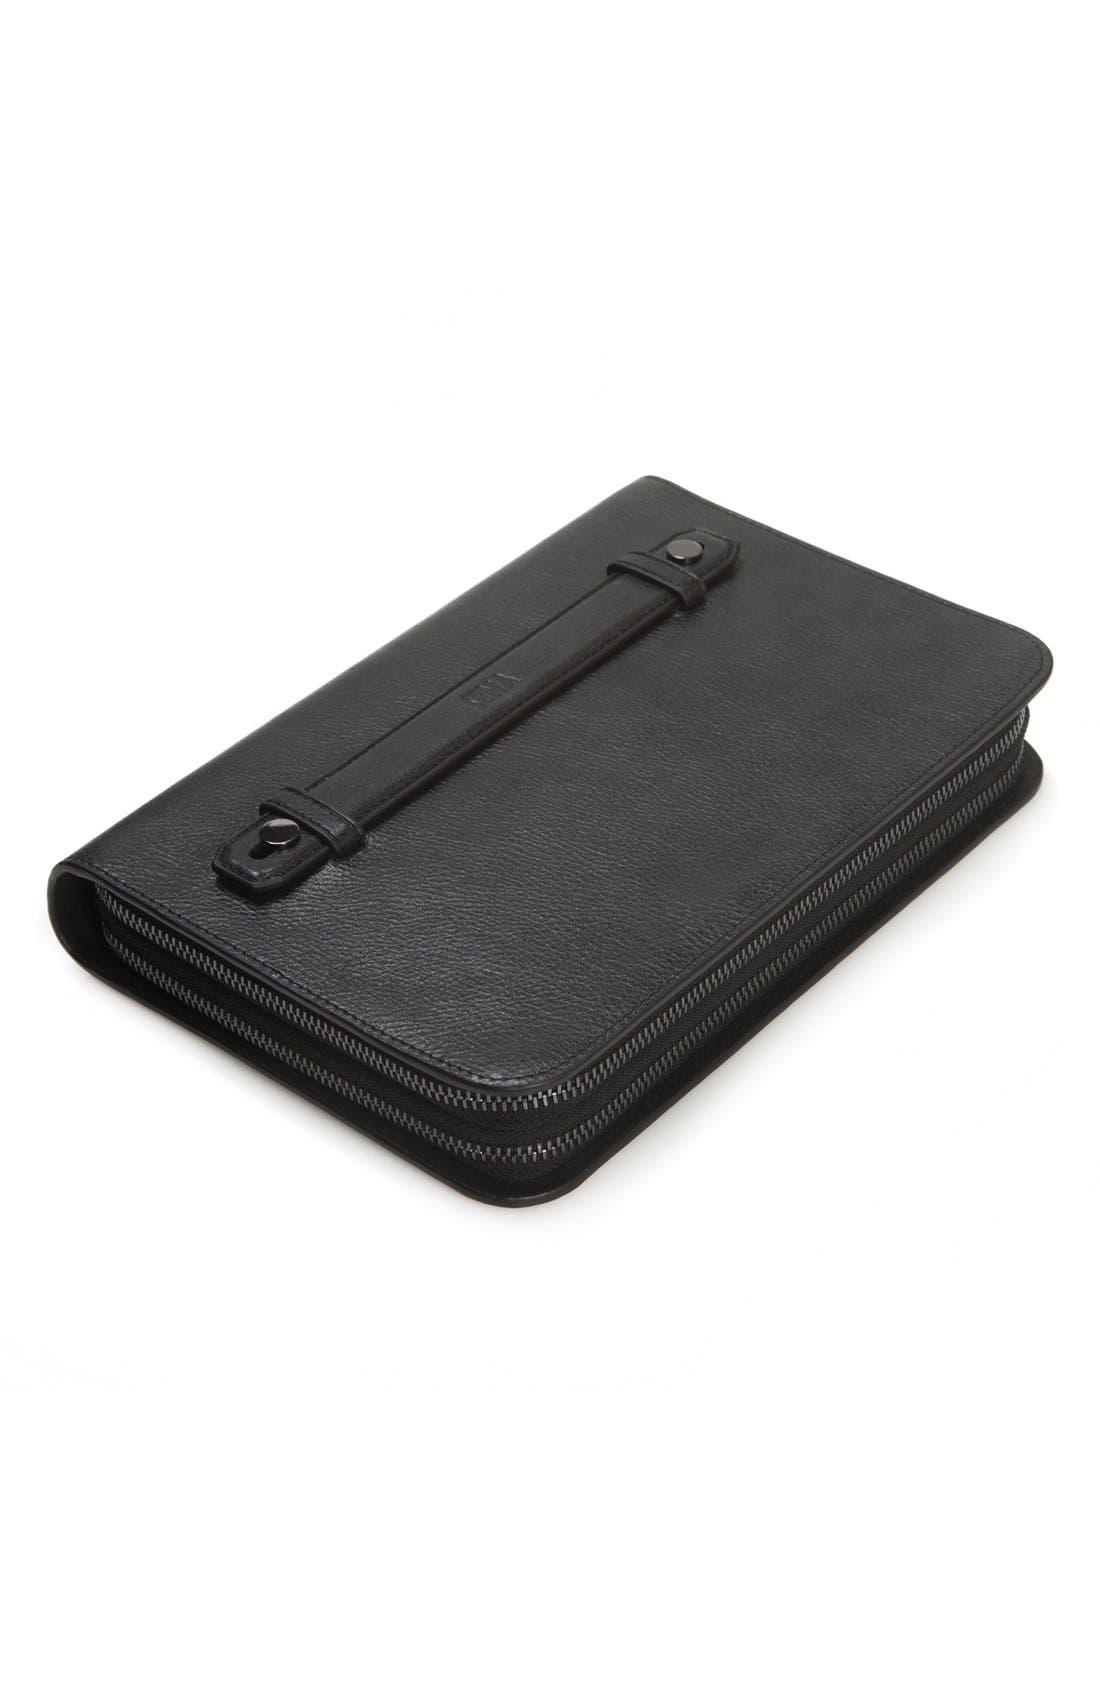 Main Image - Sena 'Heritage' iPad mini All-in-One Case